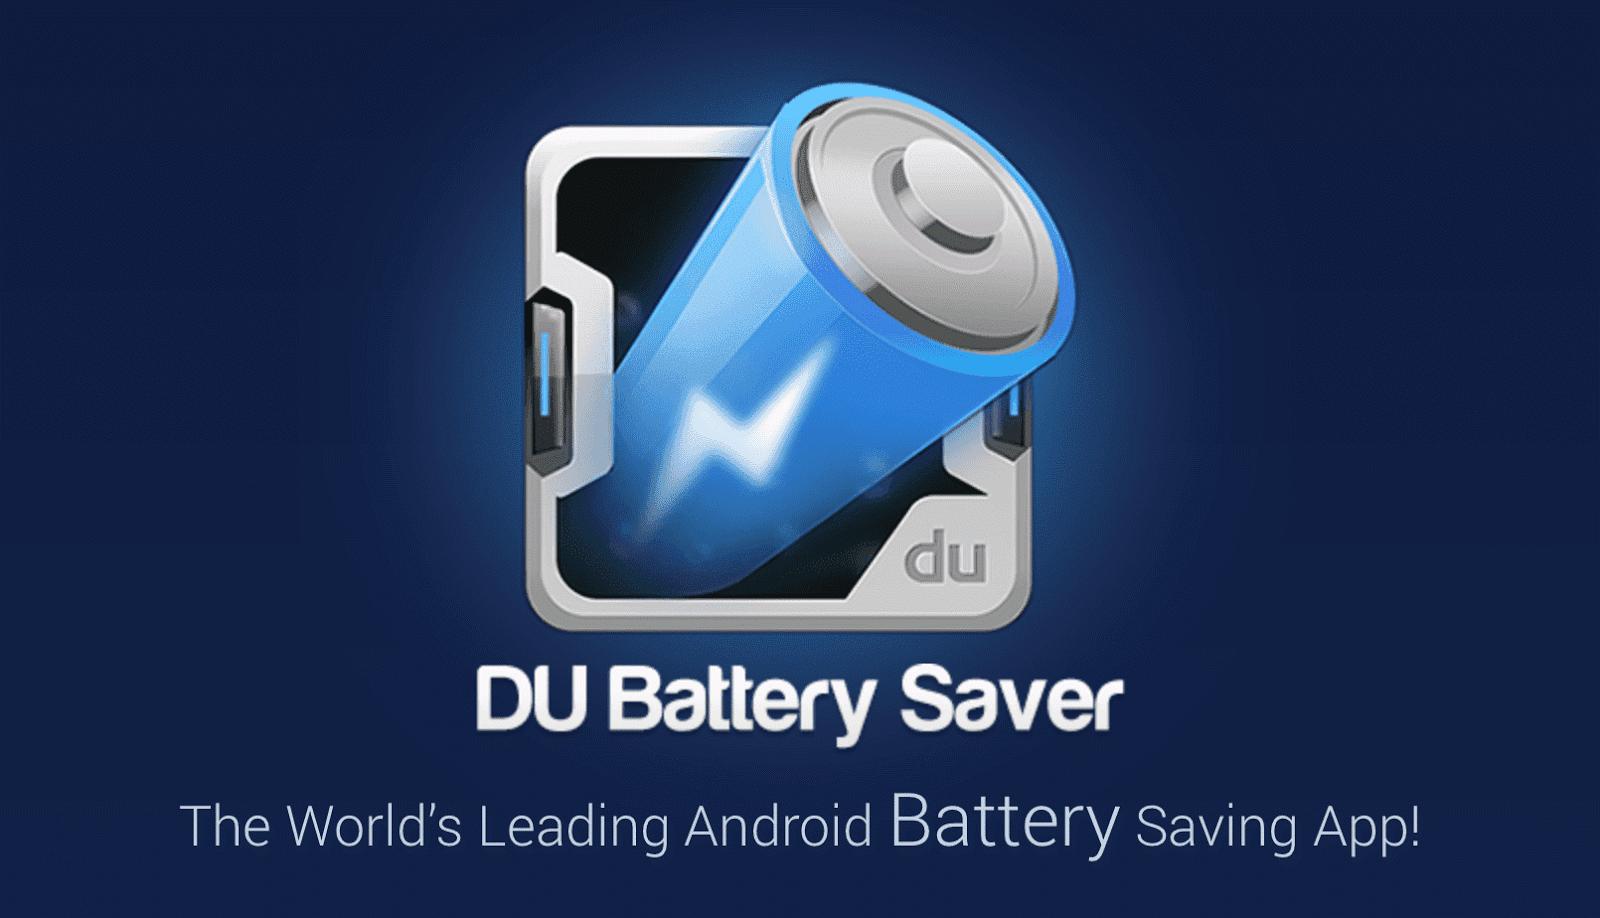 du battery saver apk 2.3.6